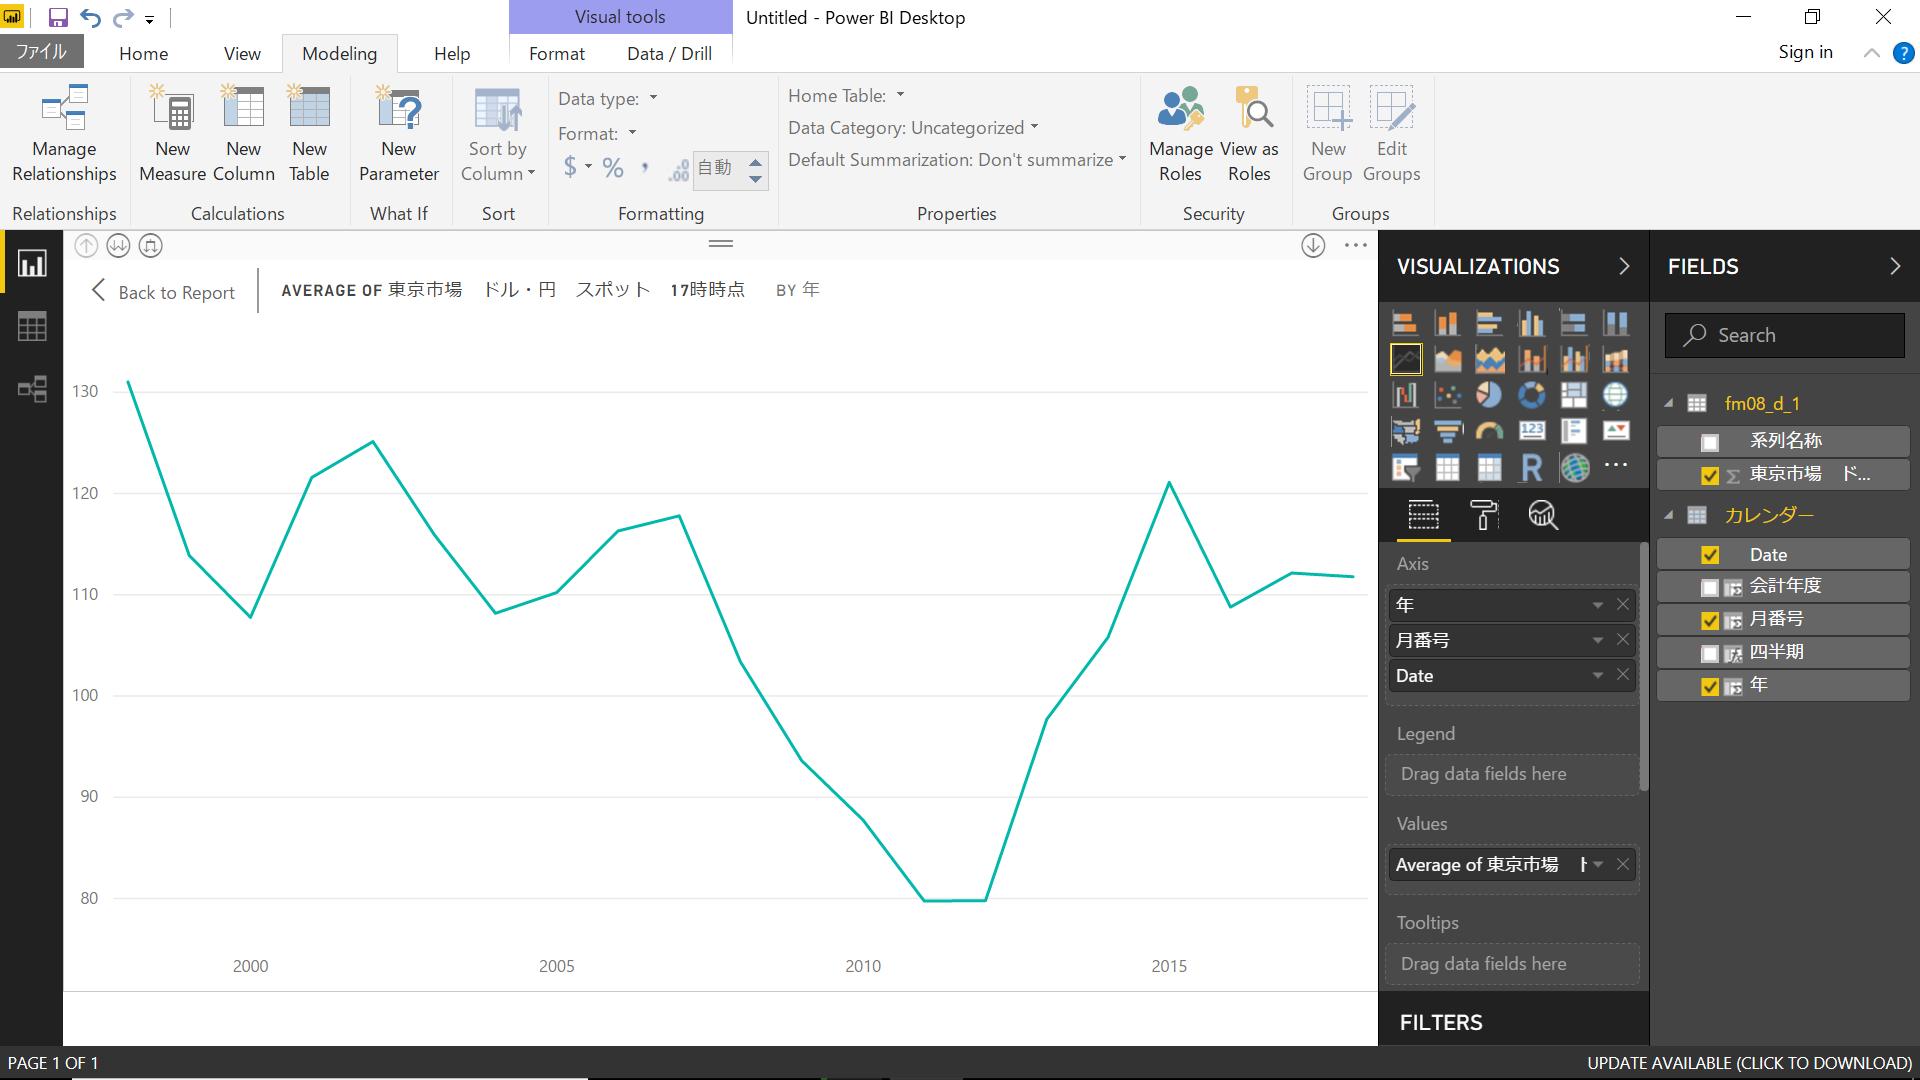 Power BIで時系列データを分析するなら、カレンダーテーブルを作るのは必須